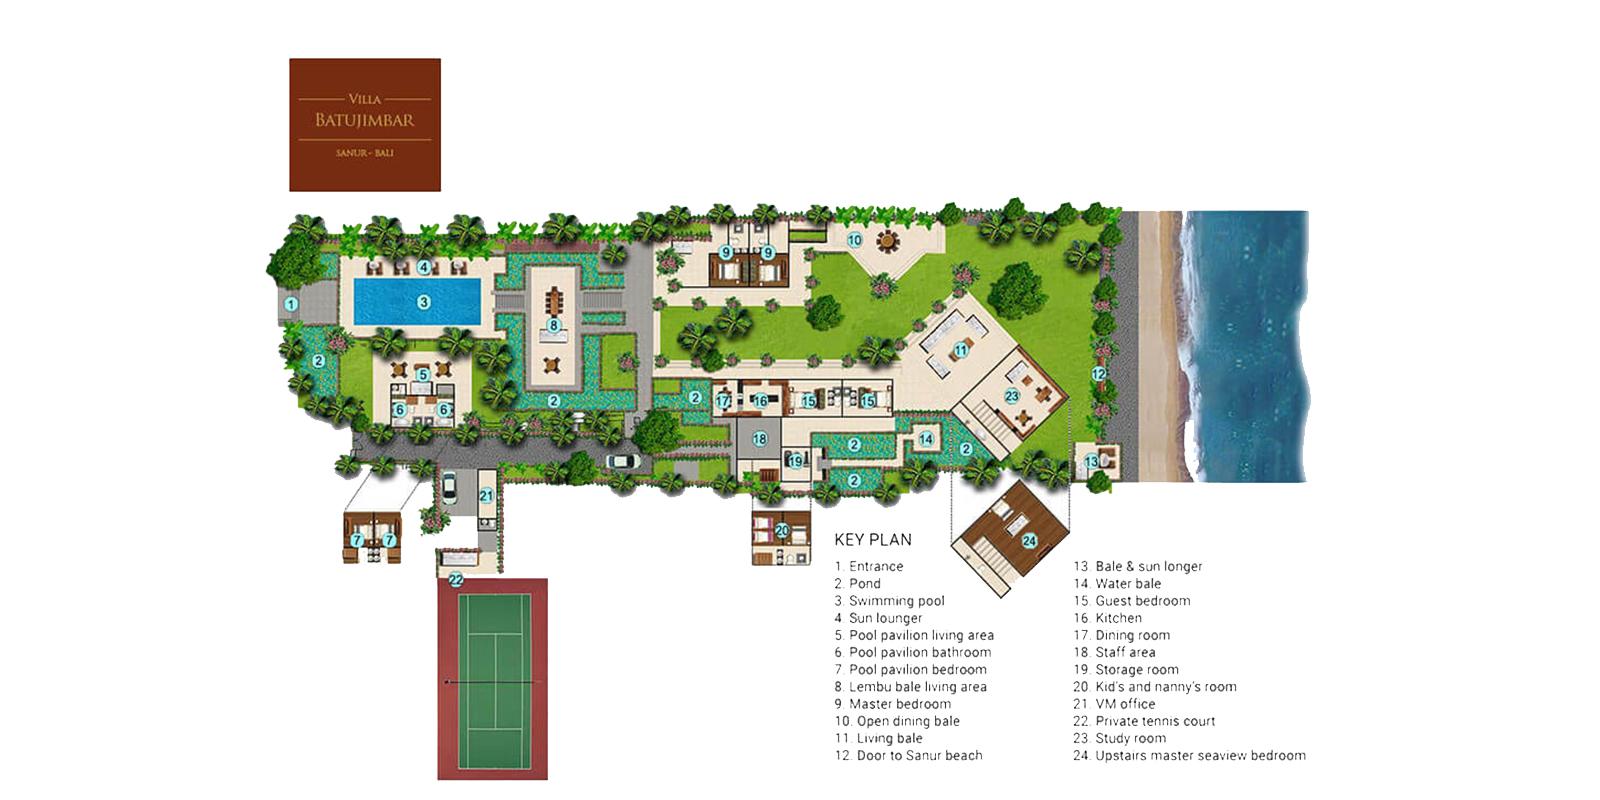 Villa Batujimbar Floor Plan | Sanur, Bali